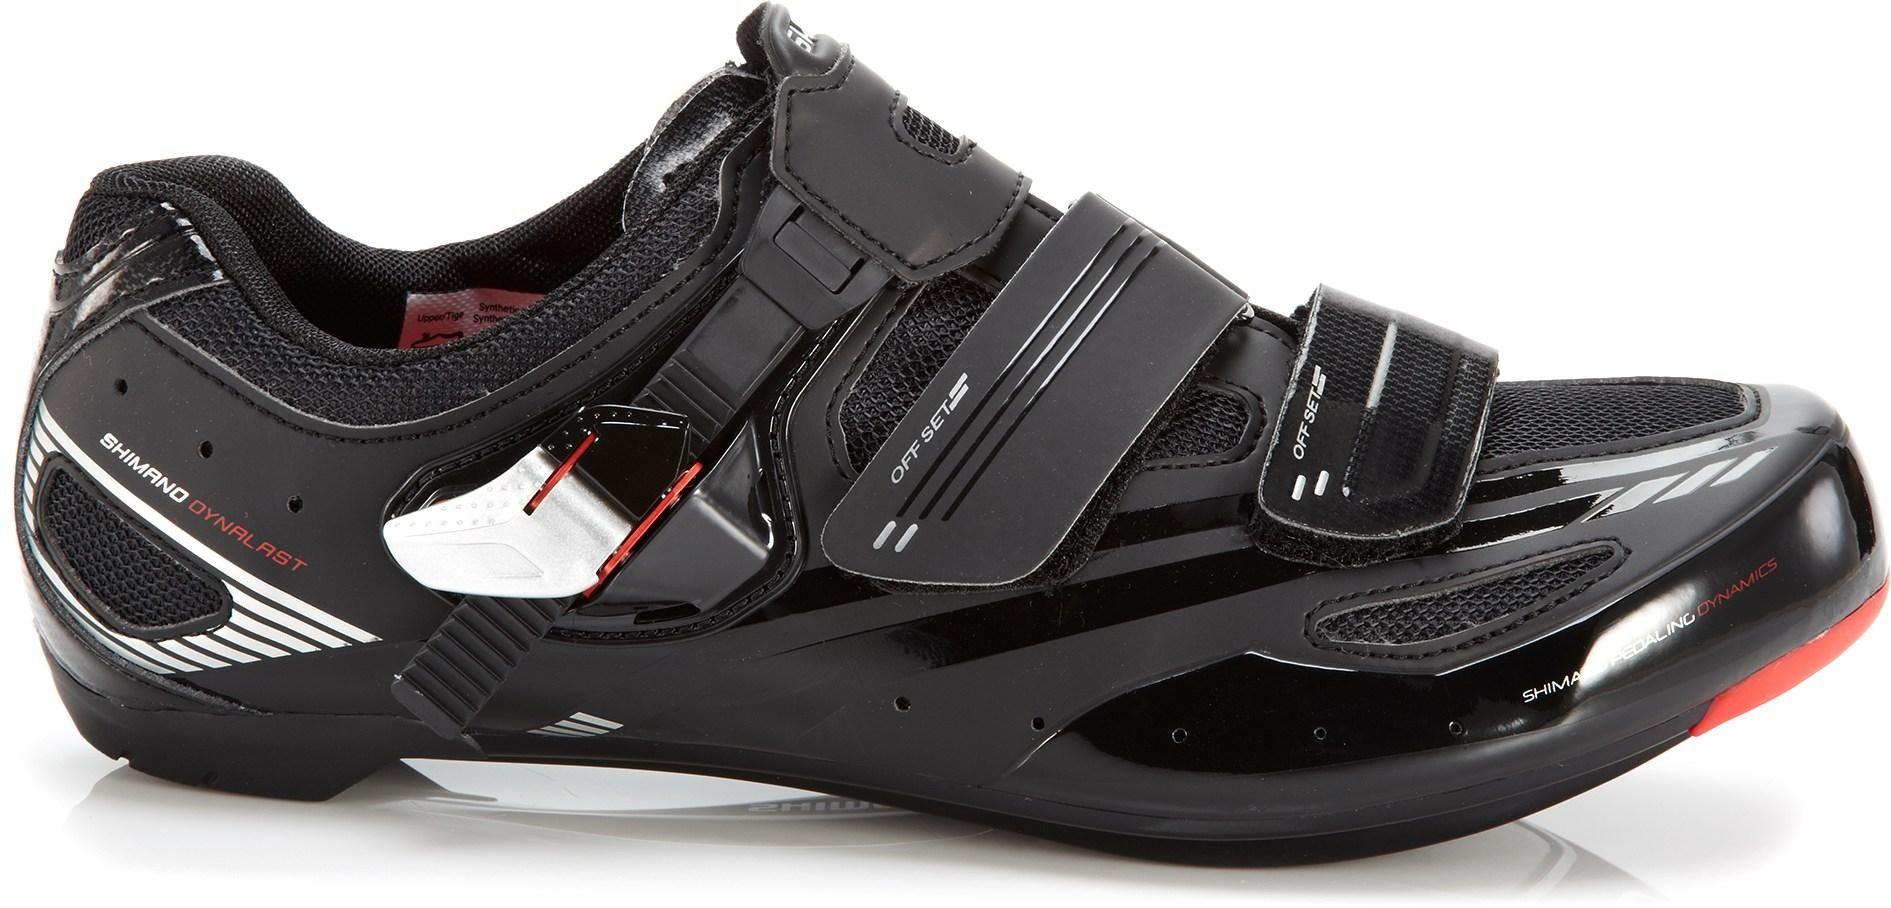 Shimano R107 Road Bike Shoes Men's REI Coop Bike